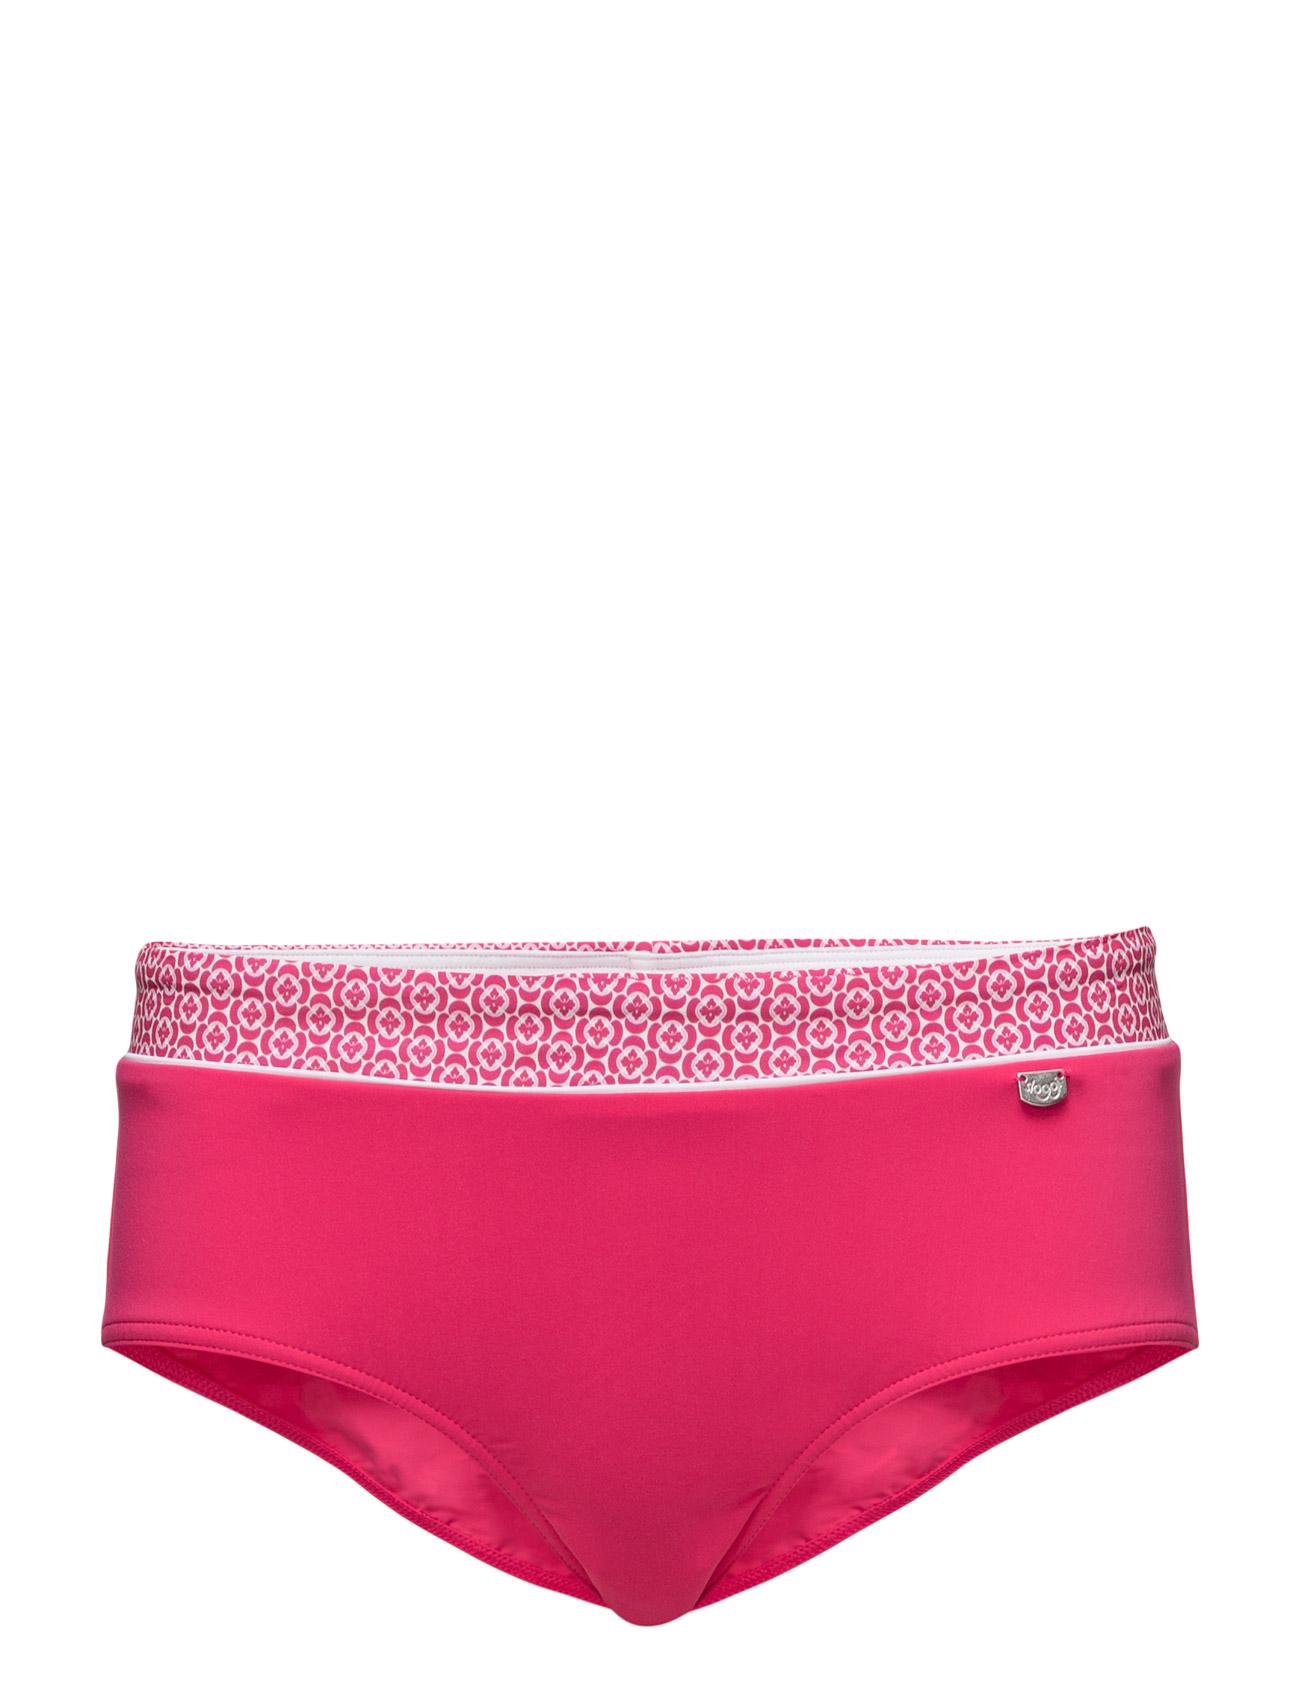 Sloggi Swim Raspberry Sweets Midi sloggi Bikinier til Damer i